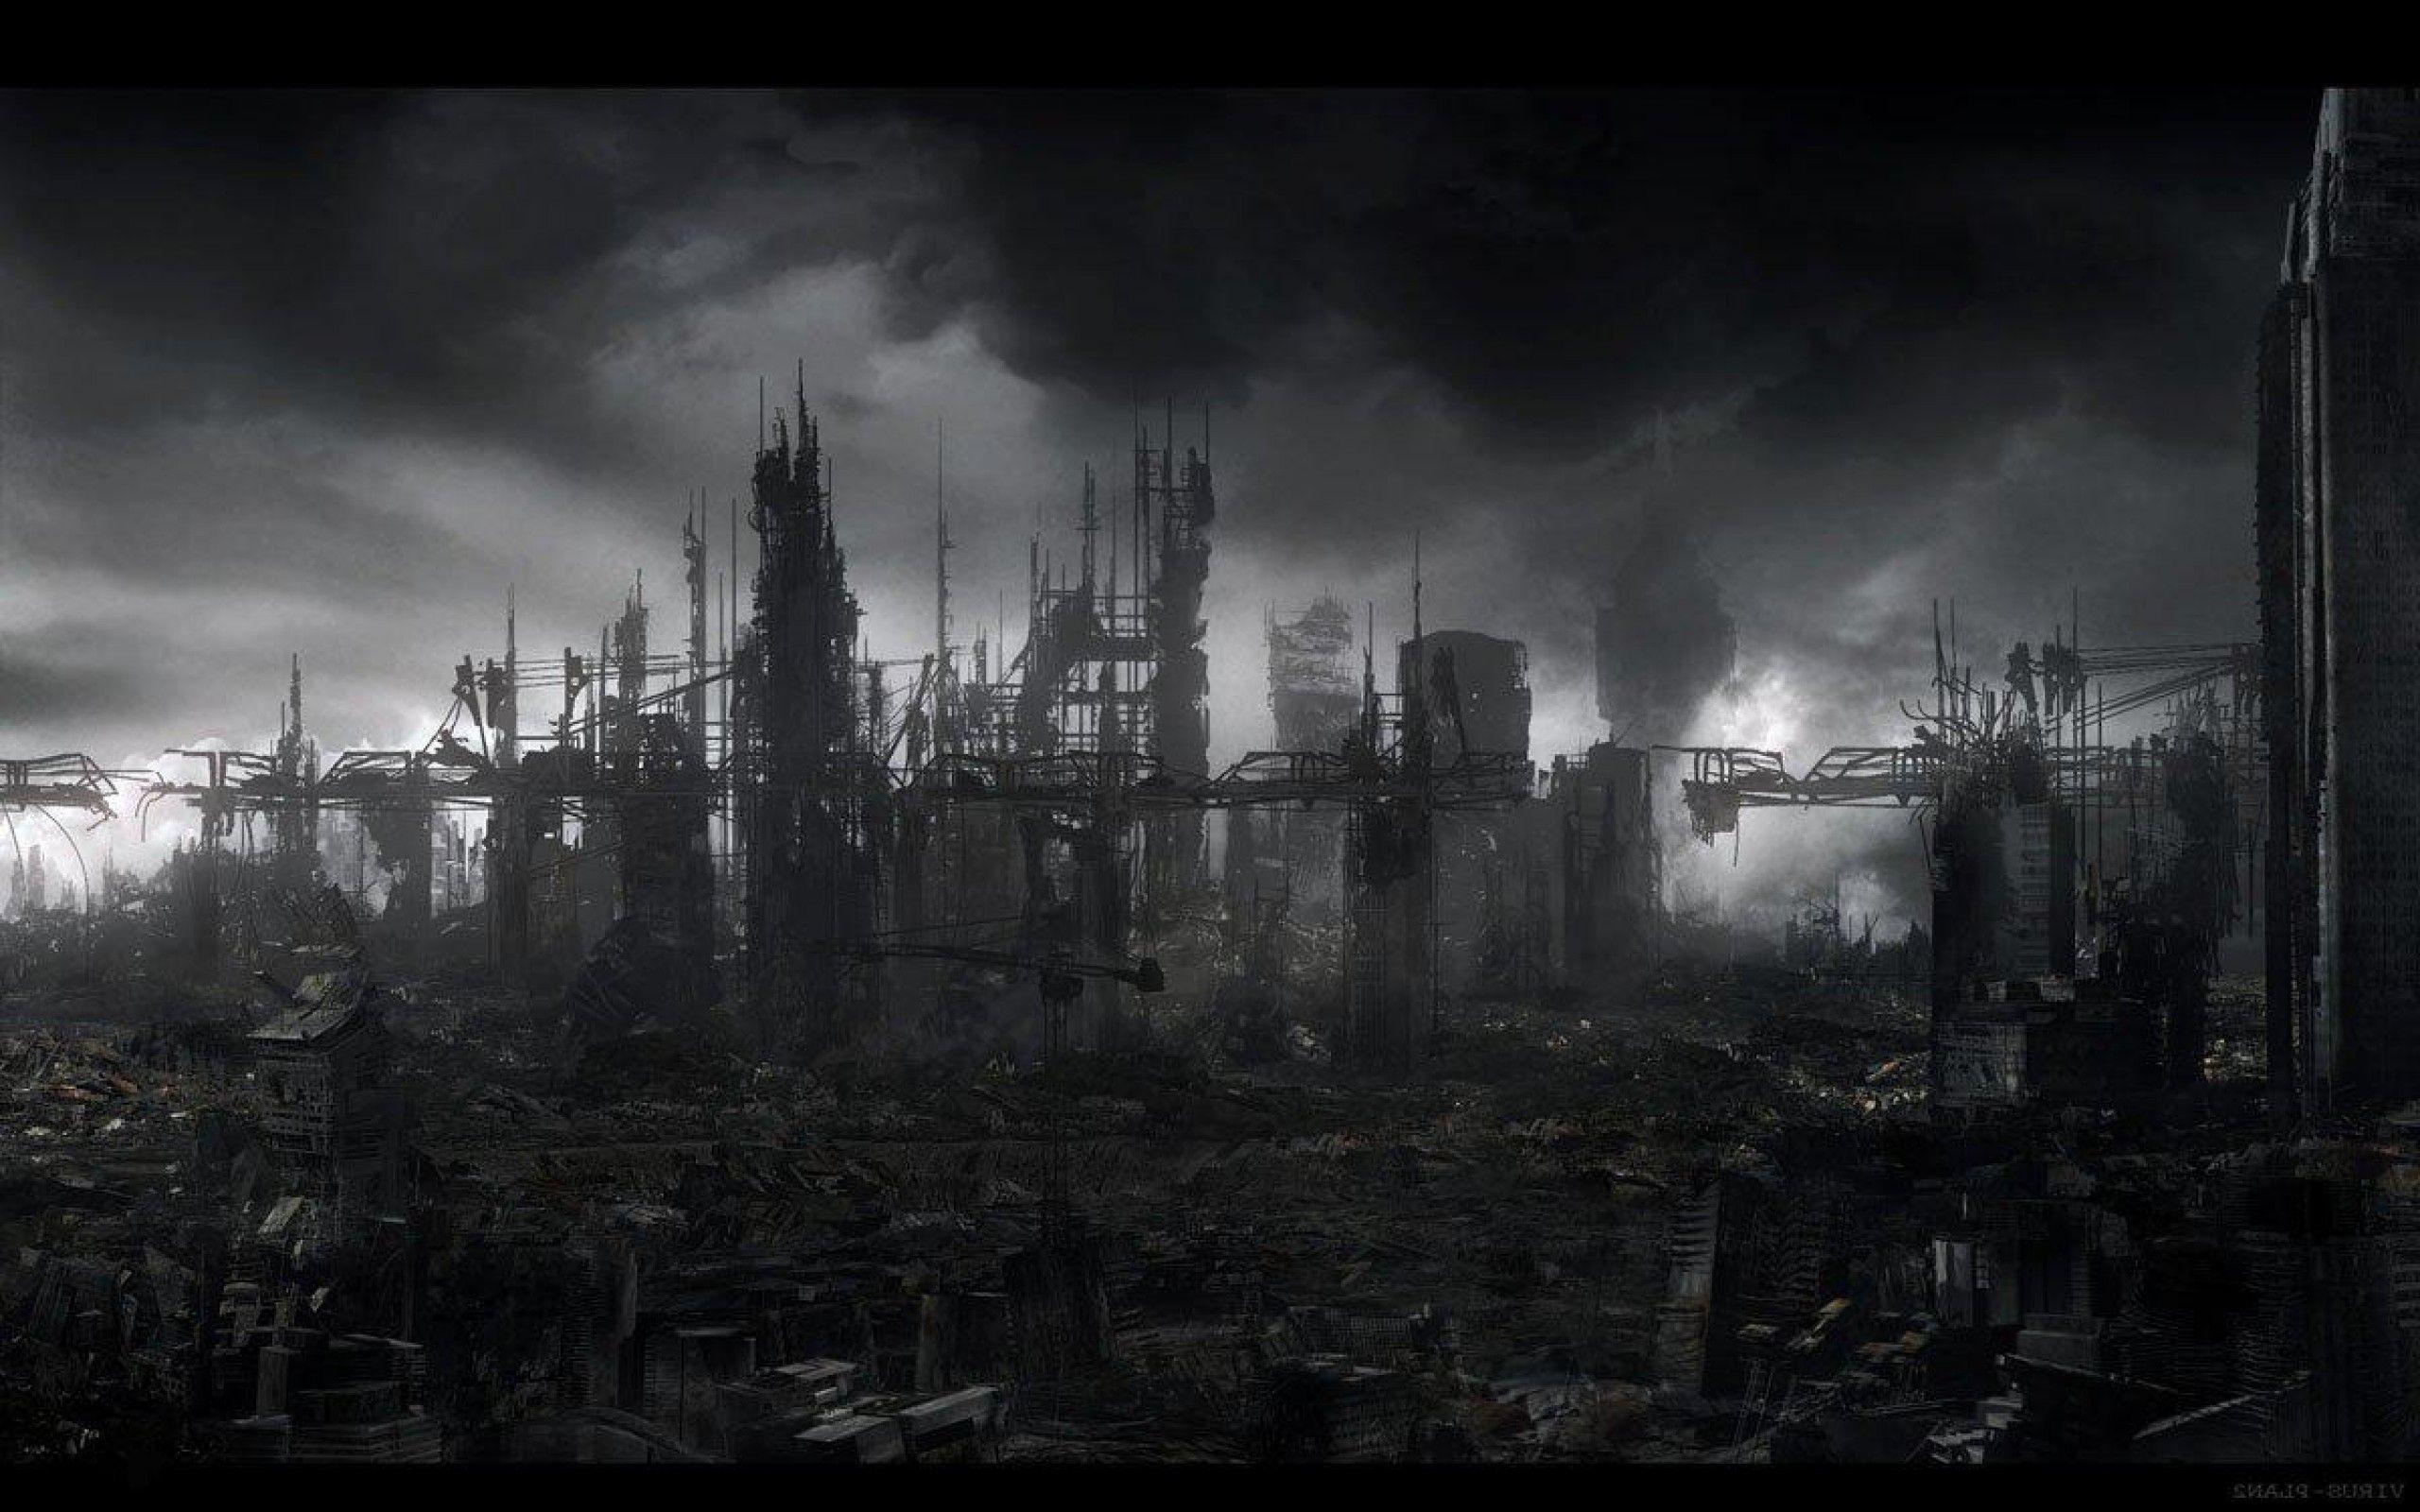 destroyed city background